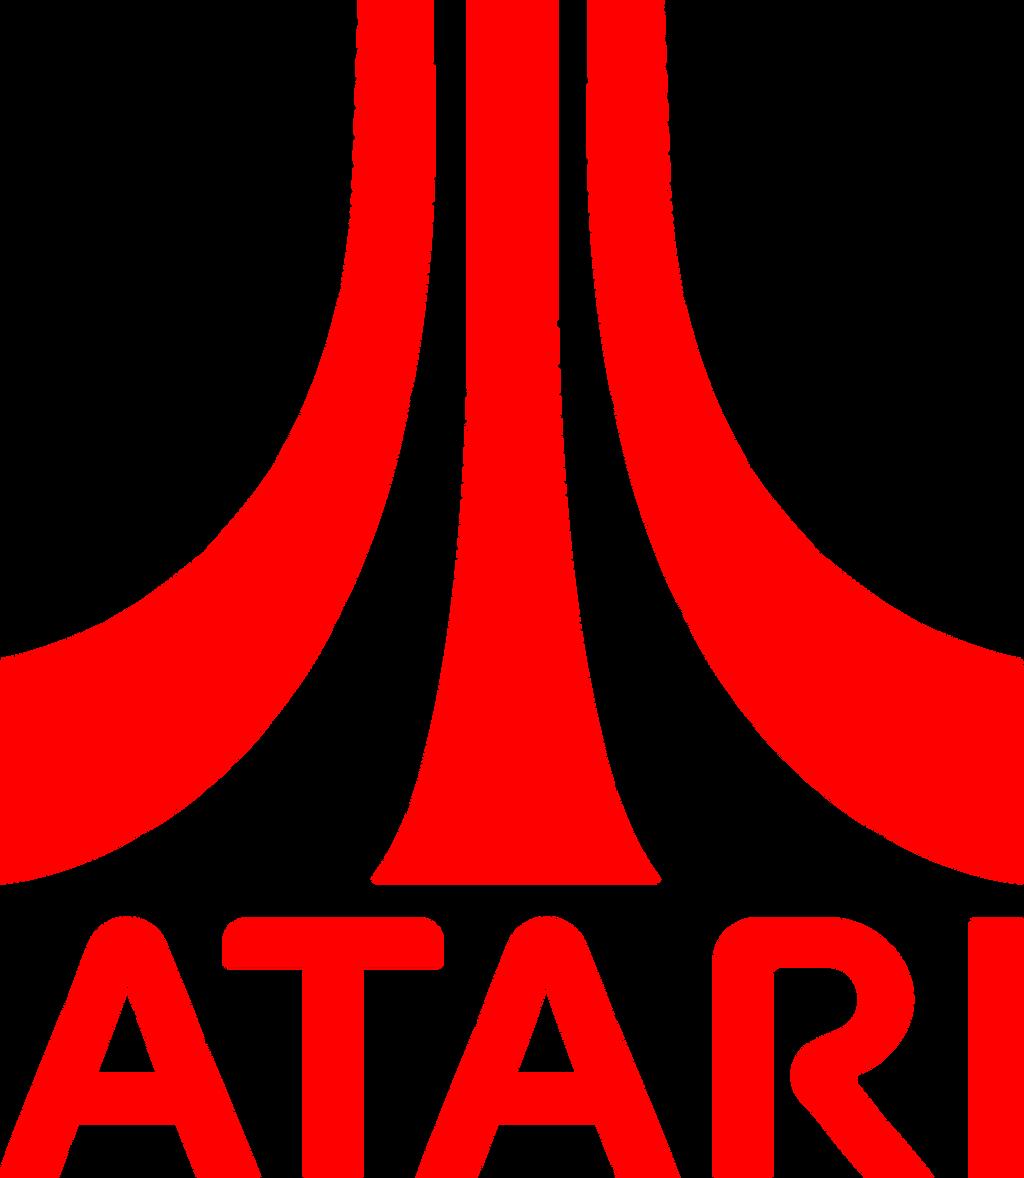 Atari Logo by DHLarson on DeviantArt